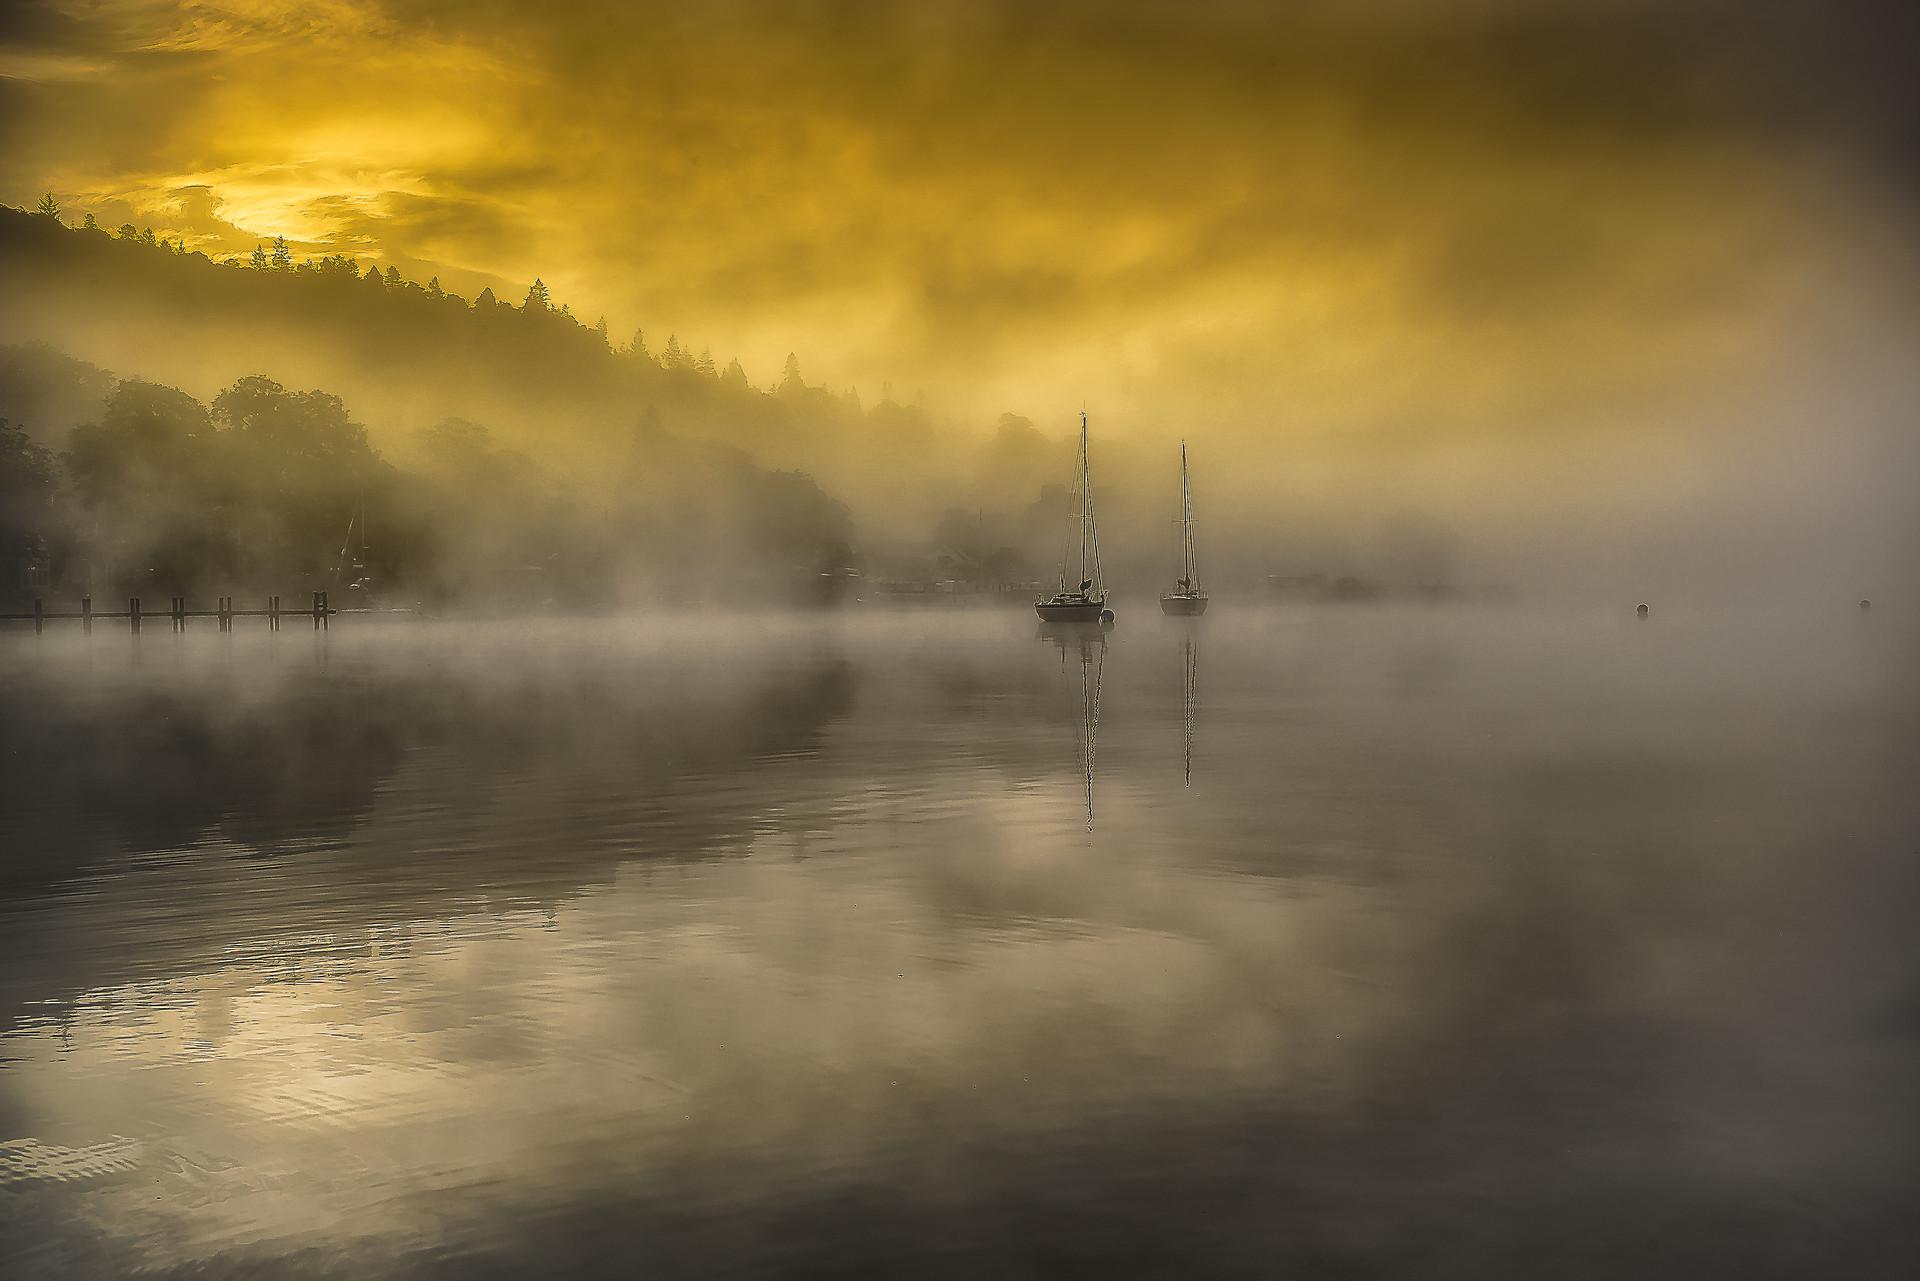 Misty Windermere